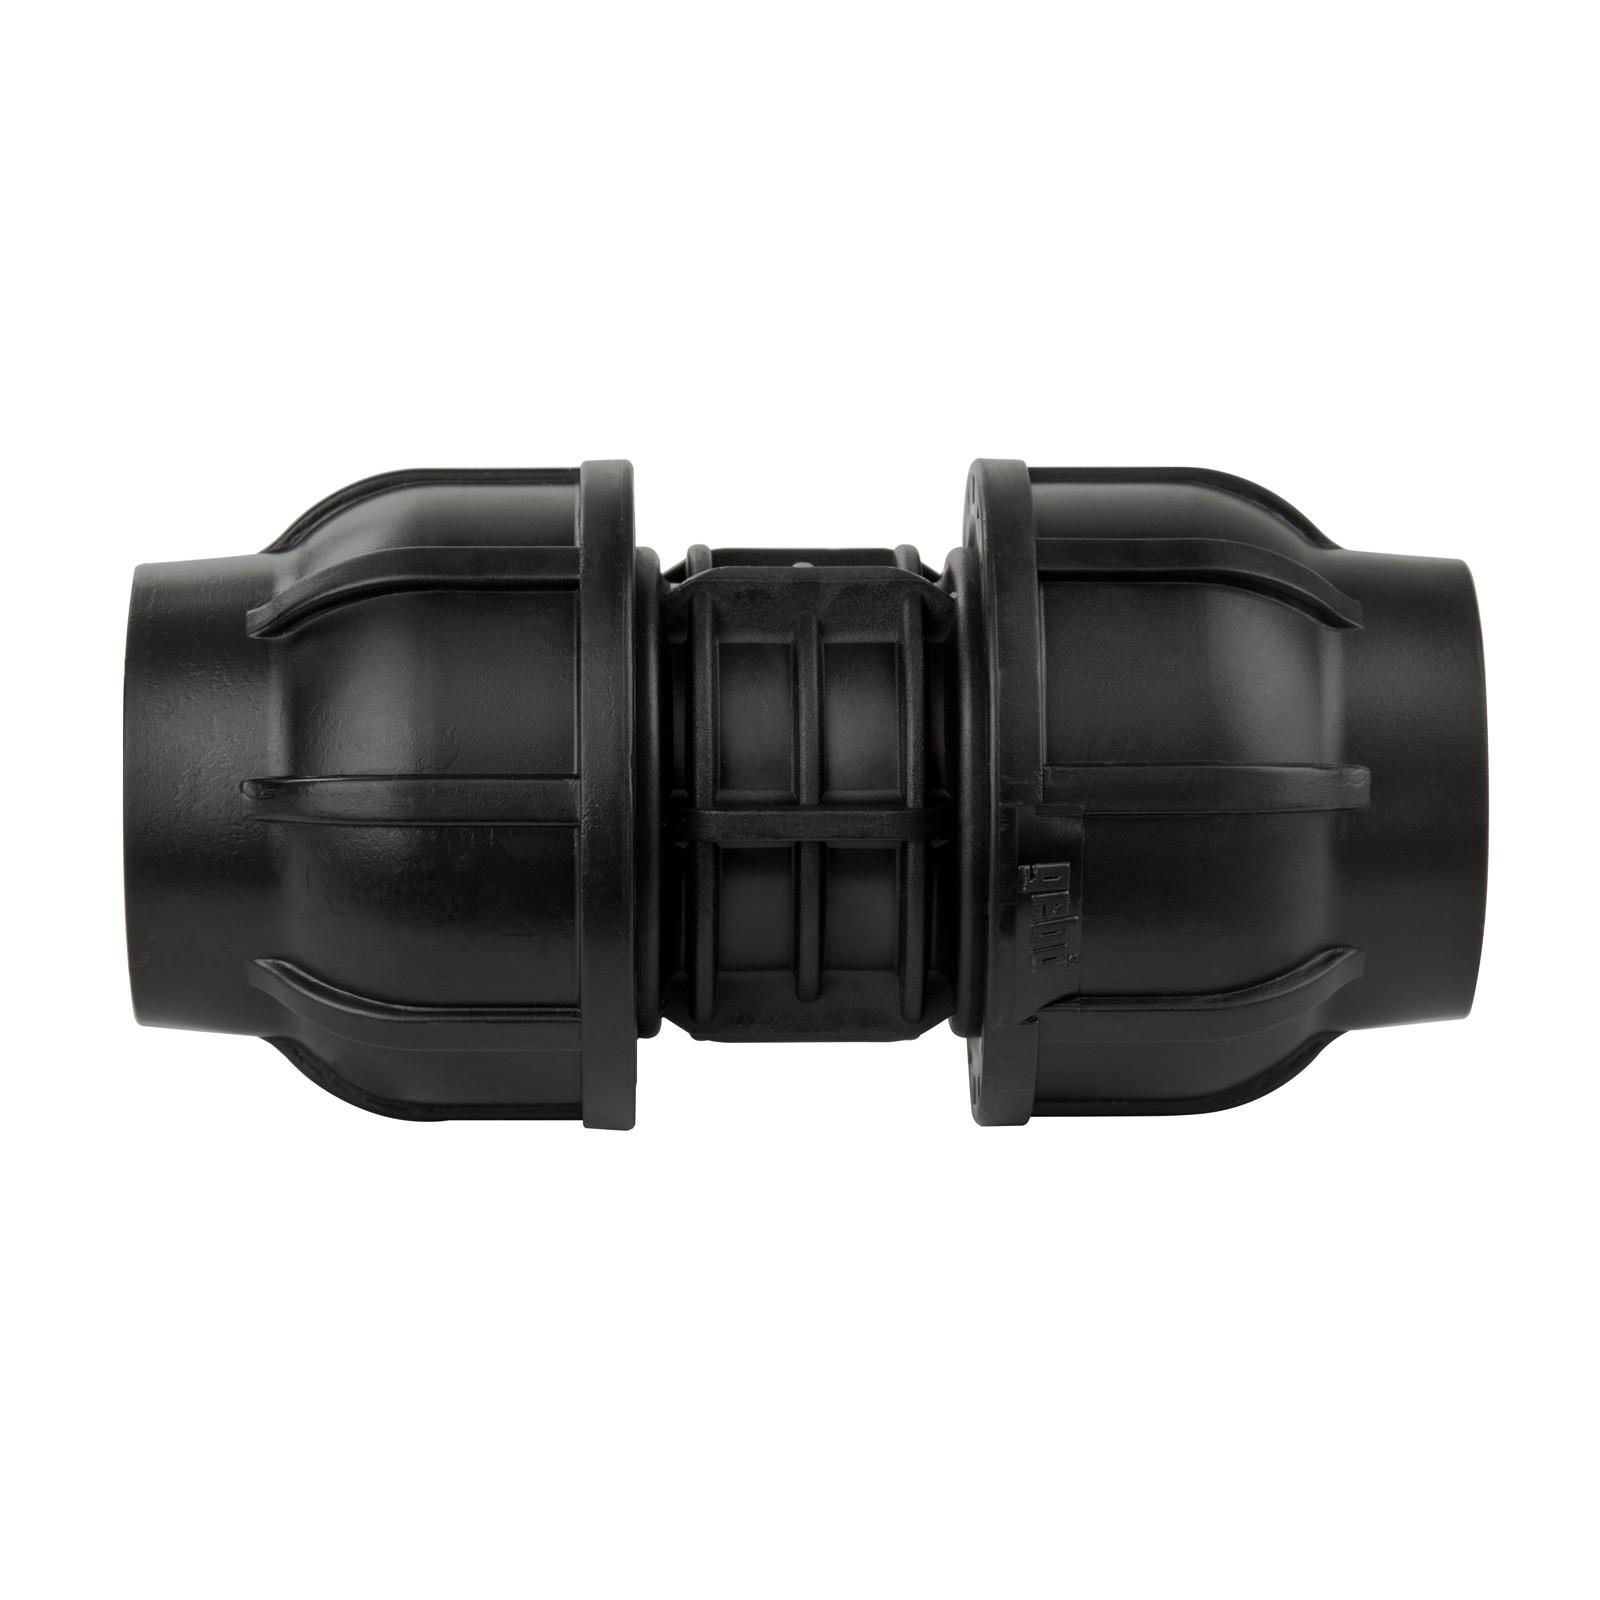 pe rohr kupplung verschraubung 40 x 25 mm muffe reduzierung. Black Bedroom Furniture Sets. Home Design Ideas